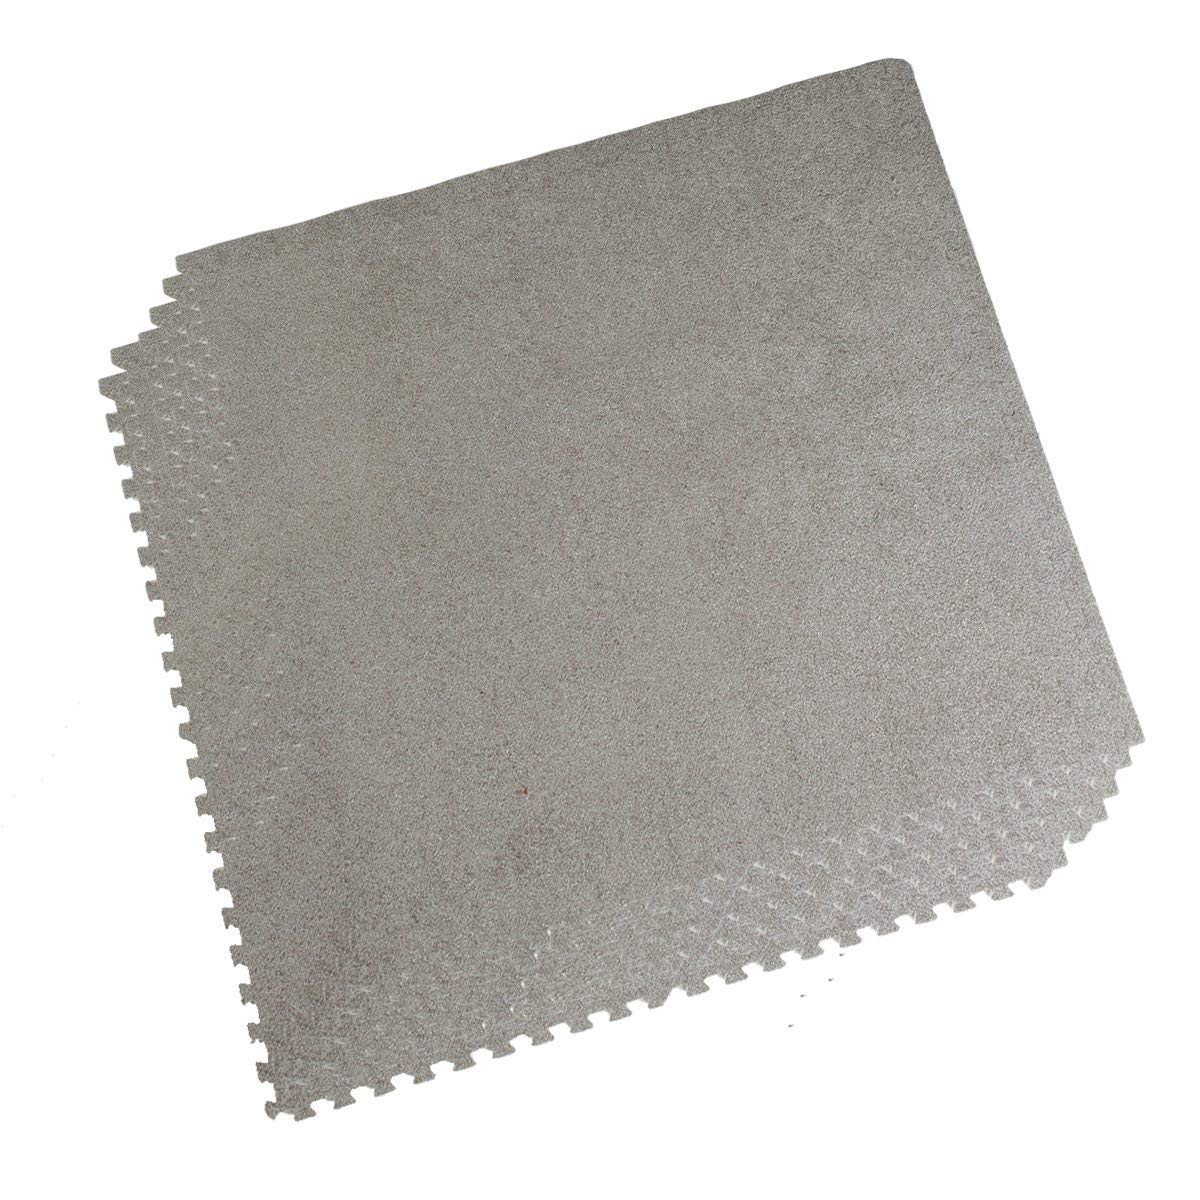 Cheap Buy Carpet Tiles Uk Find Buy Carpet Tiles Uk Deals On Line At